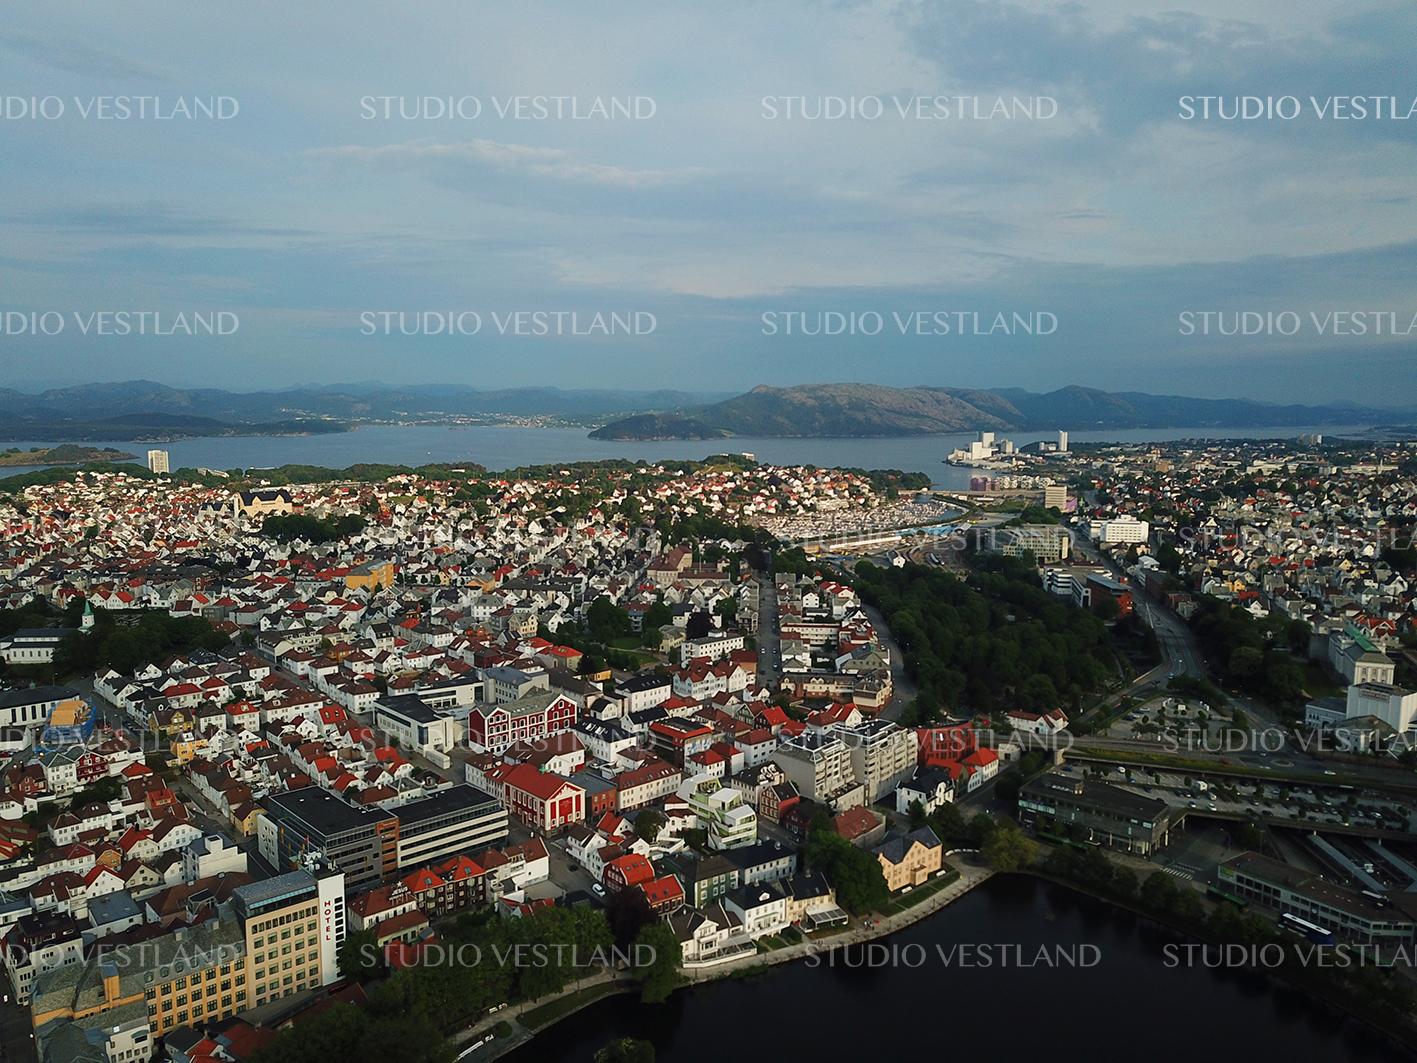 Studio Vestland - Stavanger 19